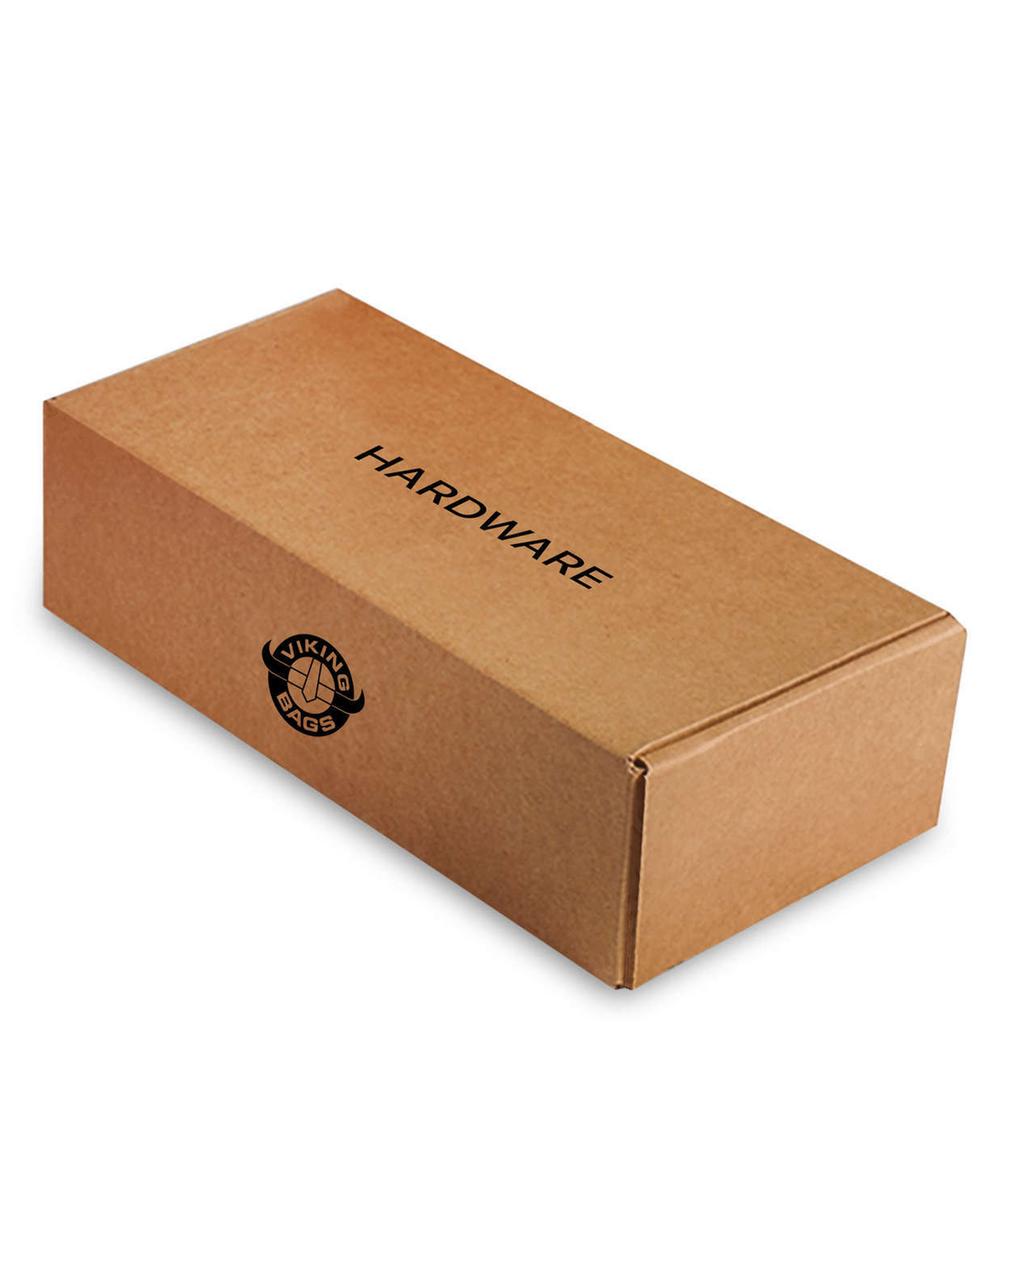 Honda VTX 1300 R Retro Viking Lamellar Slanted Leather Covered Motorcycle Hard Saddlebags Hardware Box